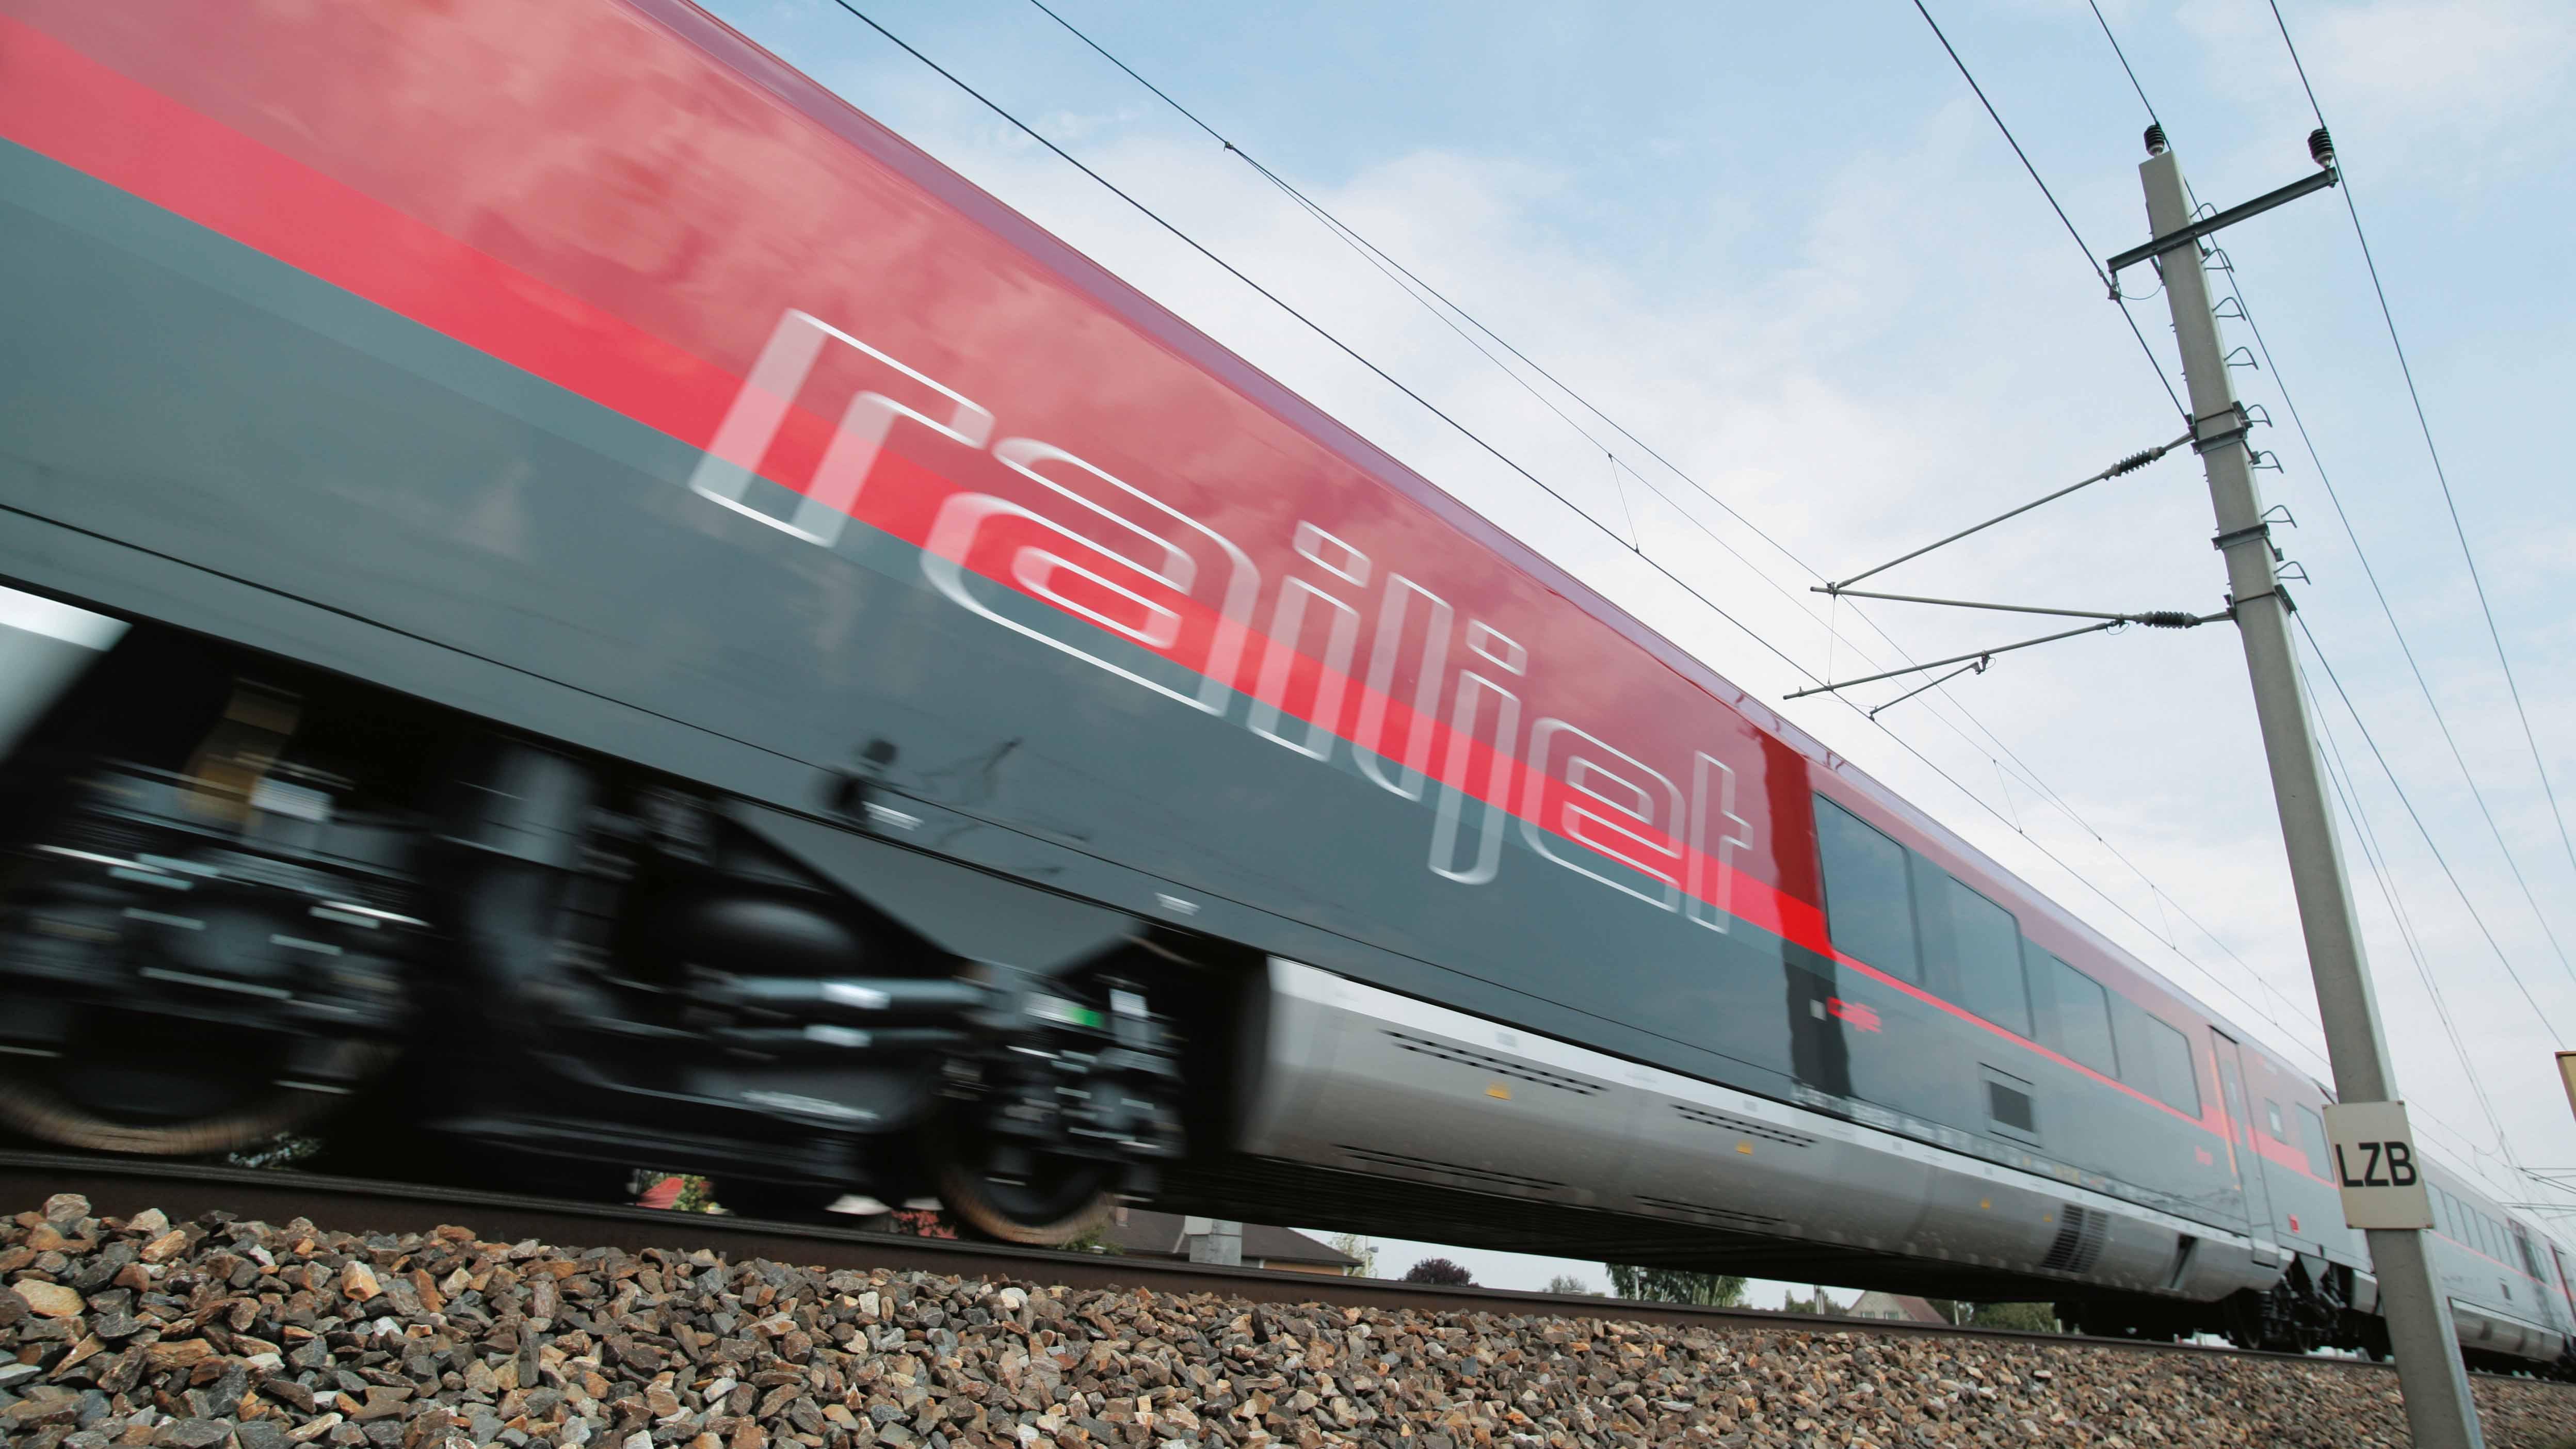 OBB-Railjet-Harald-Eisenberger